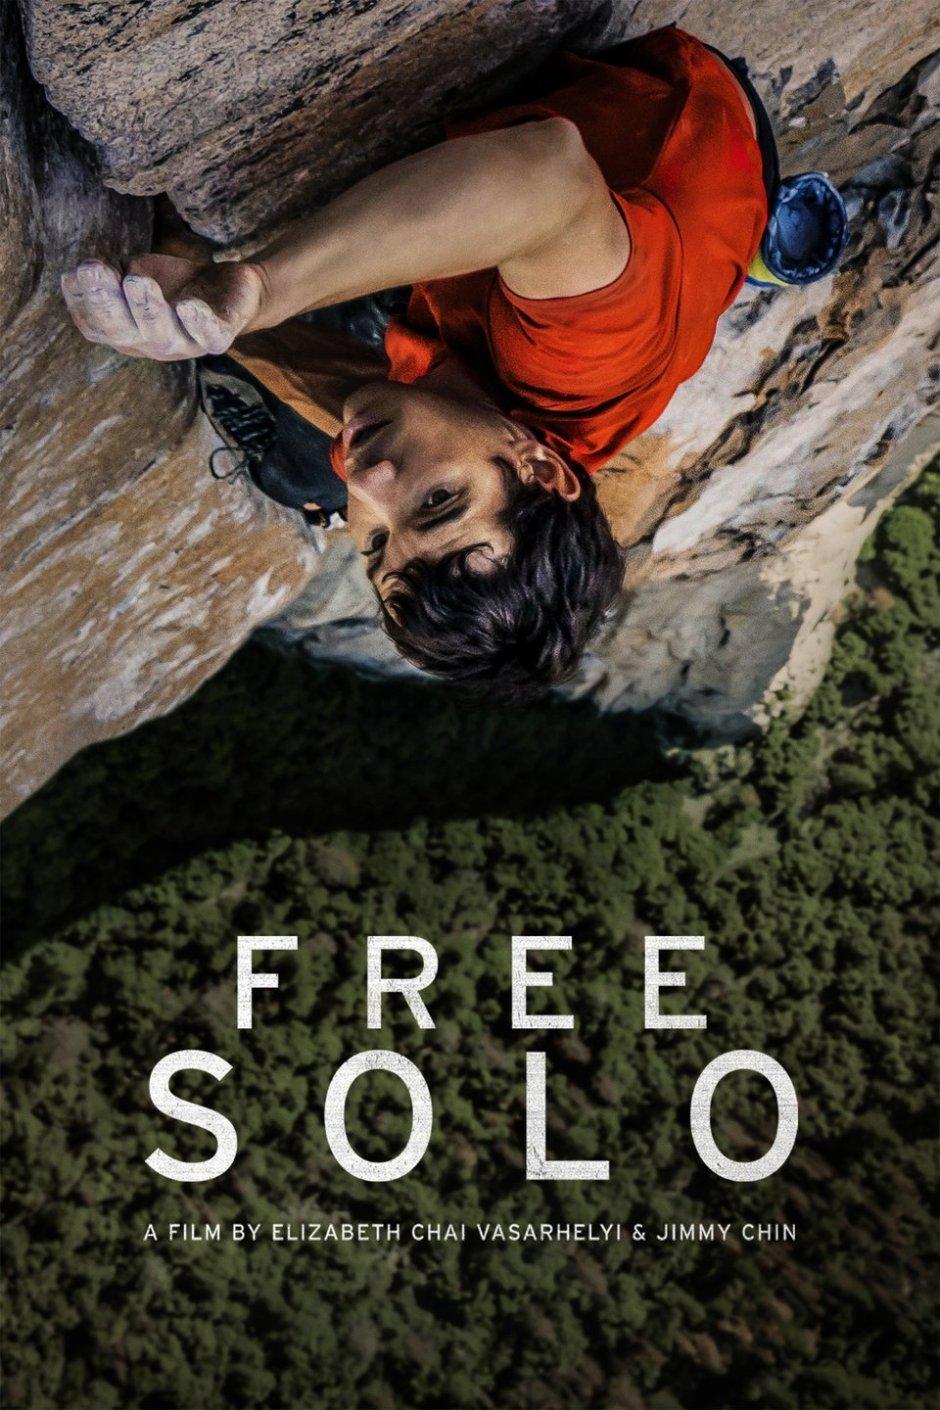 FREE SOLO POSTER YOSEMITE PRE TRIP 4-19.jpg